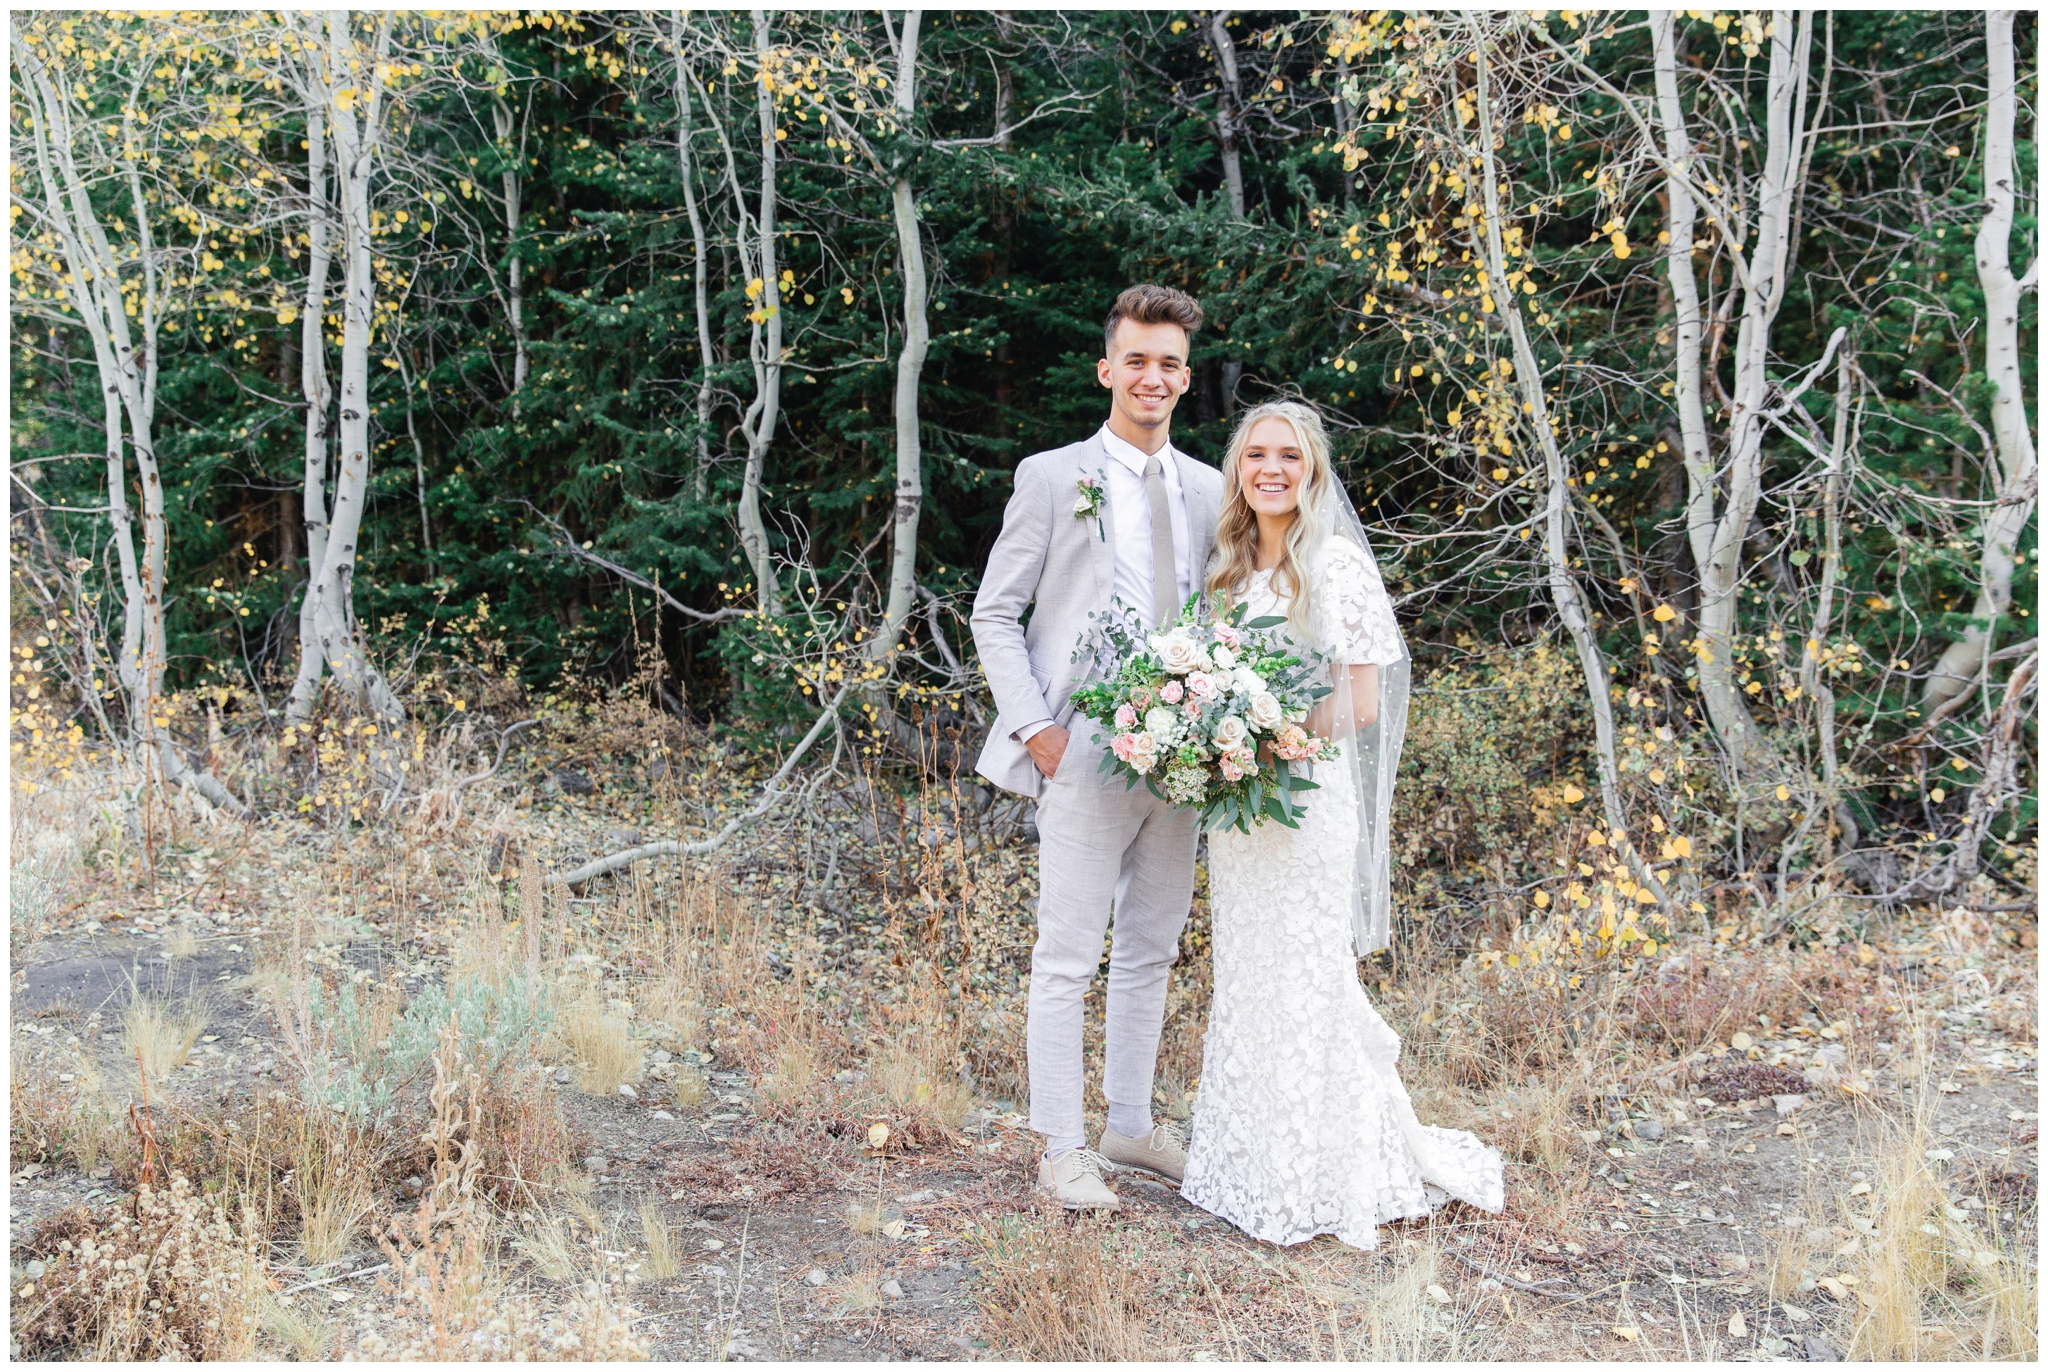 Bride and groom smiling at the camera at Jordan pines